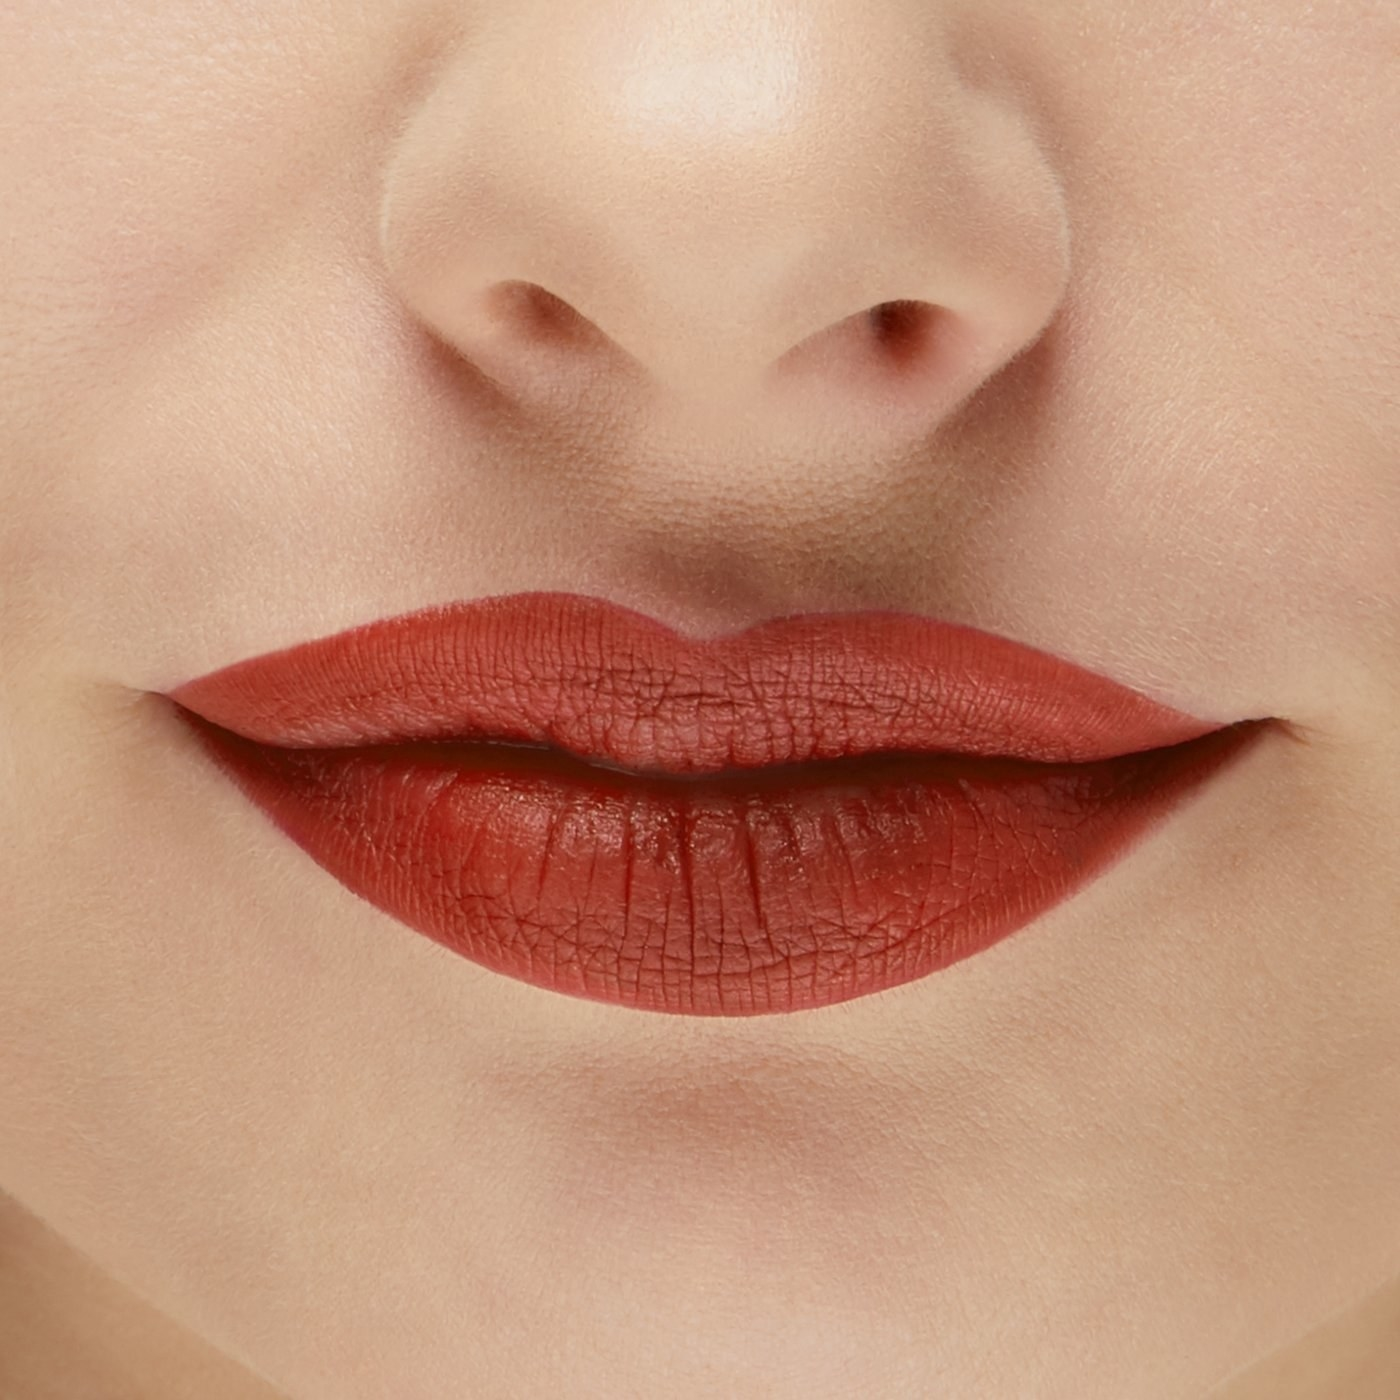 Lips wearing the orange-ish, brown-red lipstick shade